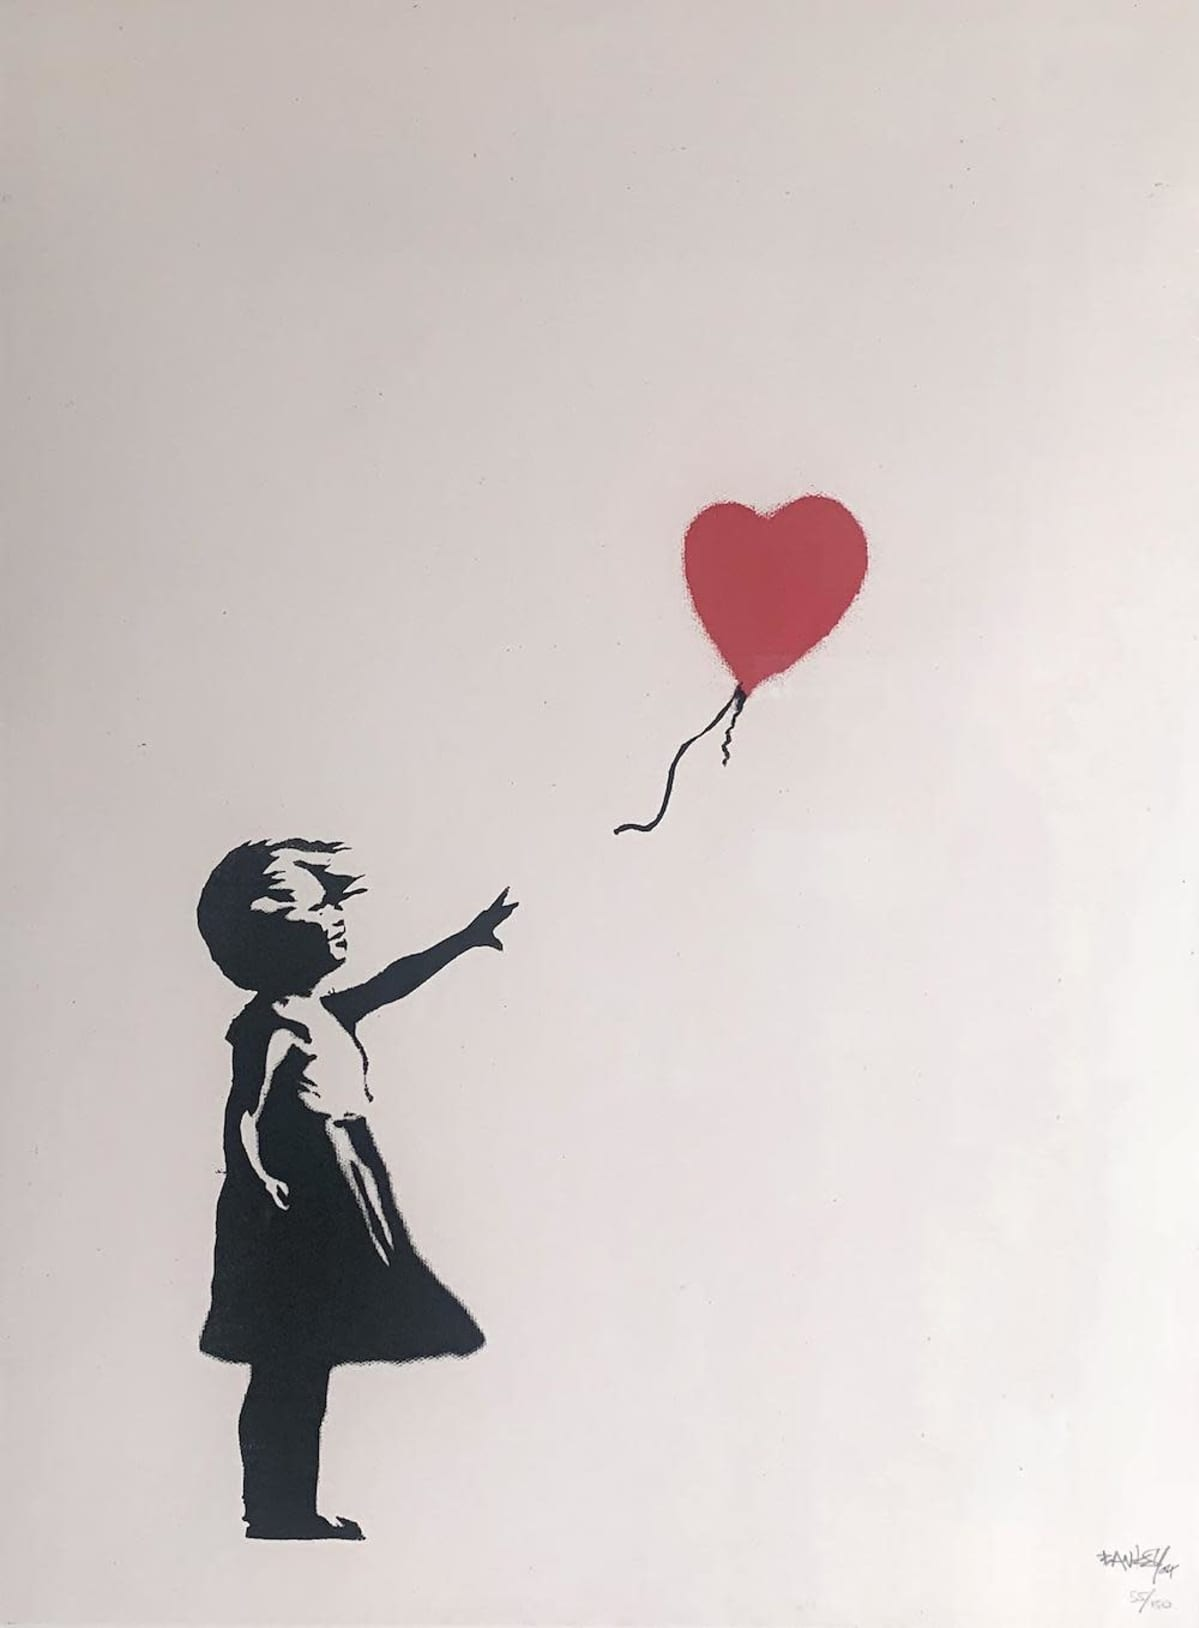 Banksyn teos The girl with Balloon.